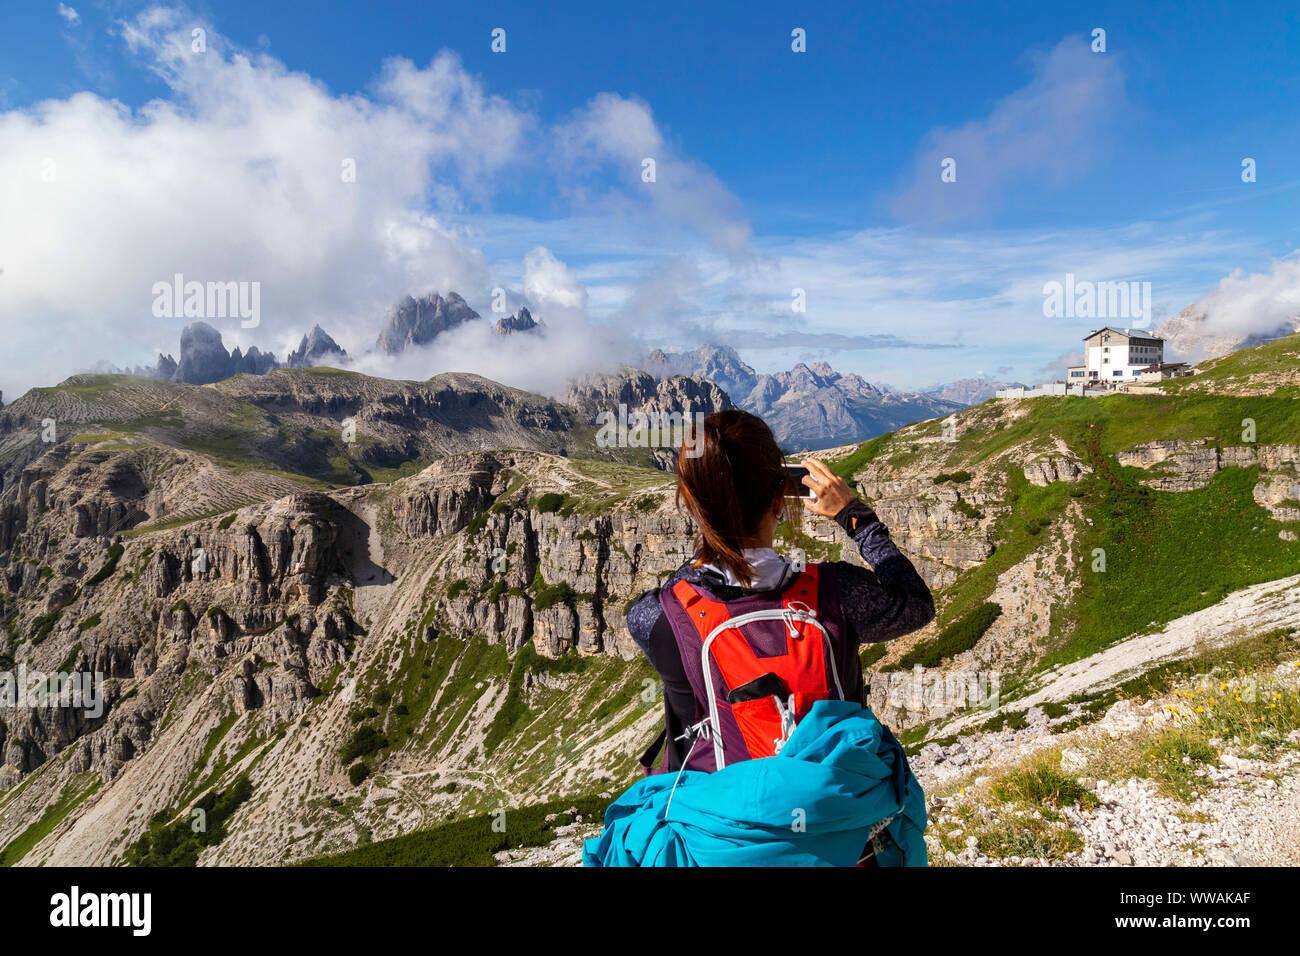 Girl photographing the Auronzo Refuge. Panoramic view of Cadini di Misurina and Auronzo refuge. Veneto Sesto Dolomites Italy Europe. Auronzo alpine hu Stock Photo